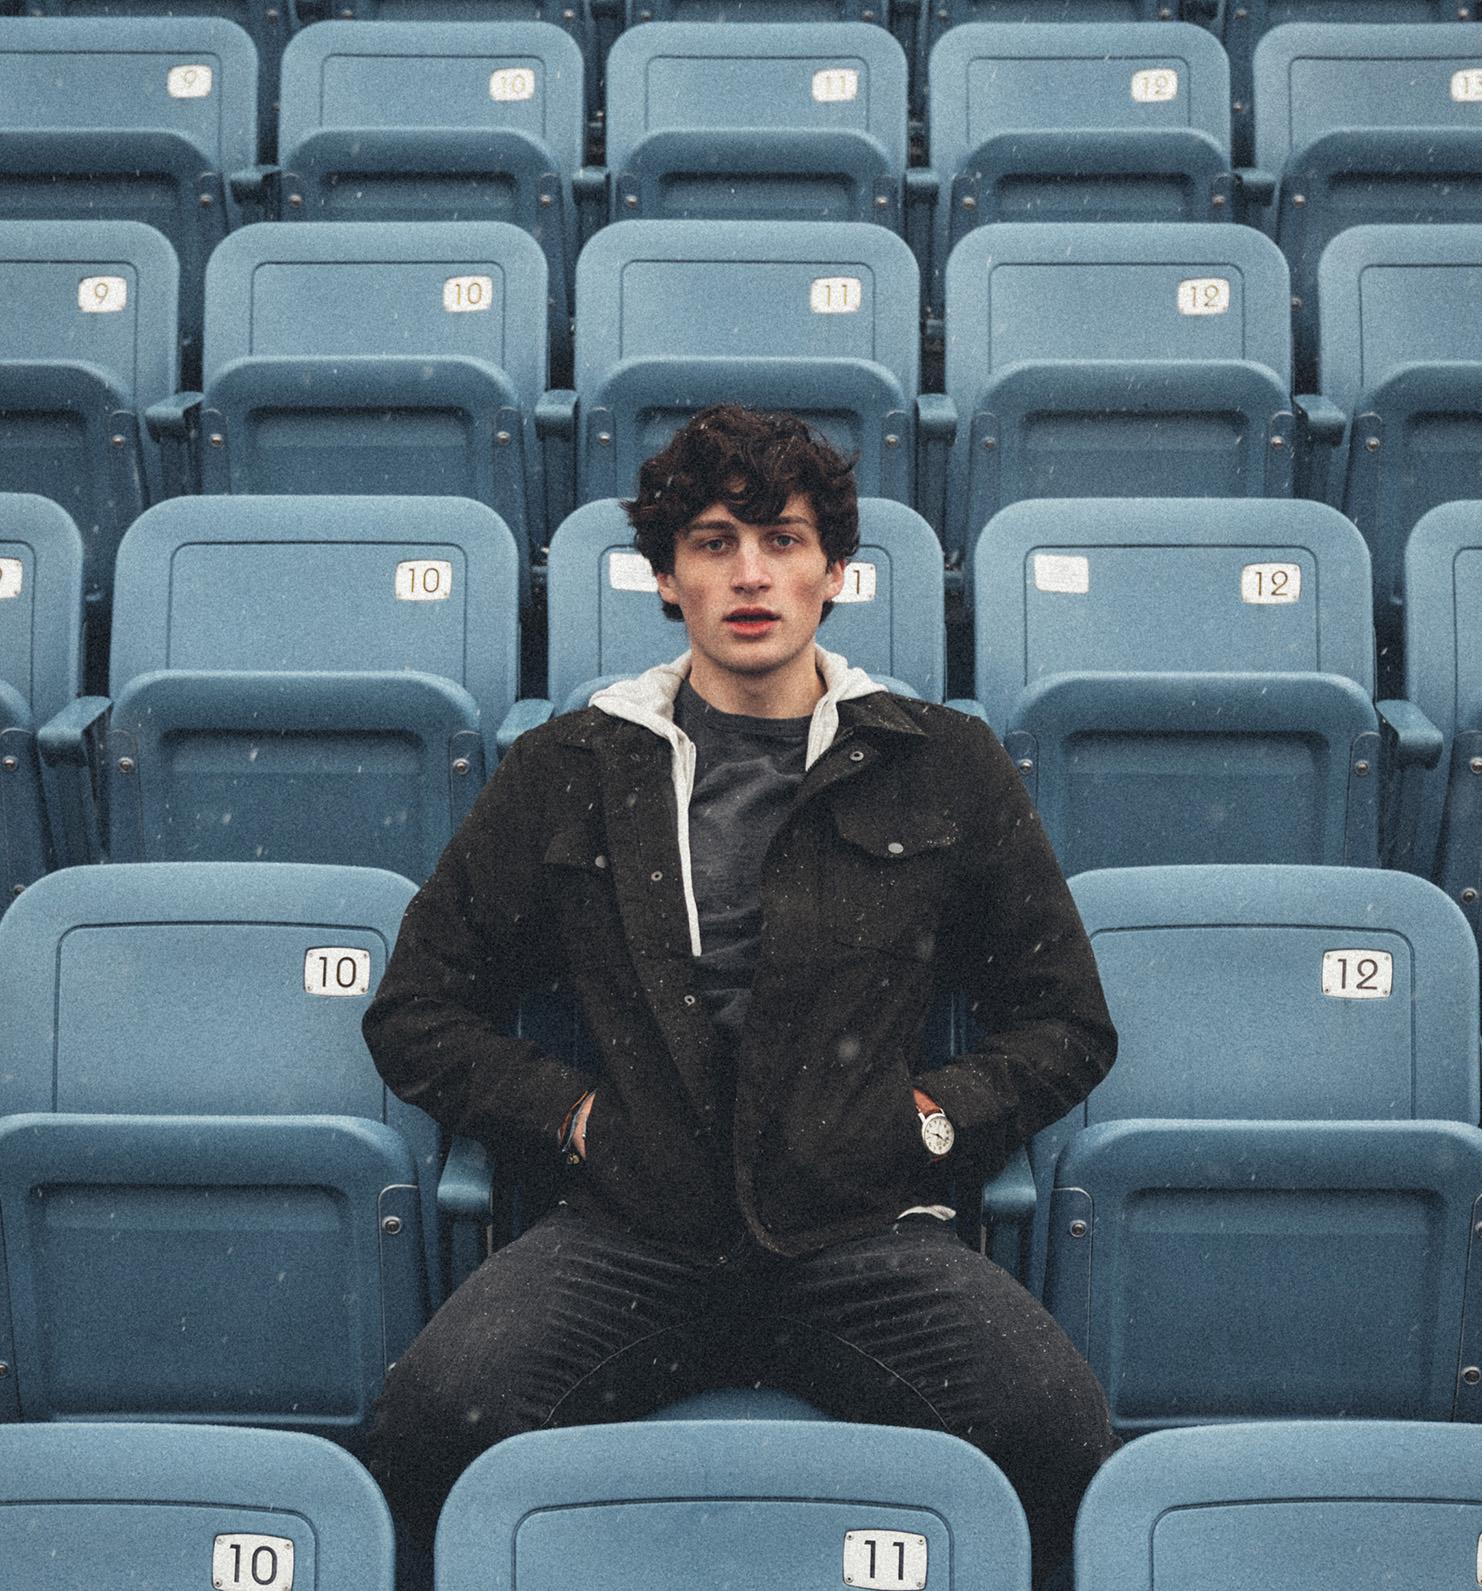 TRACK PREMIERE: Jordan Dean shares new single 'Local'